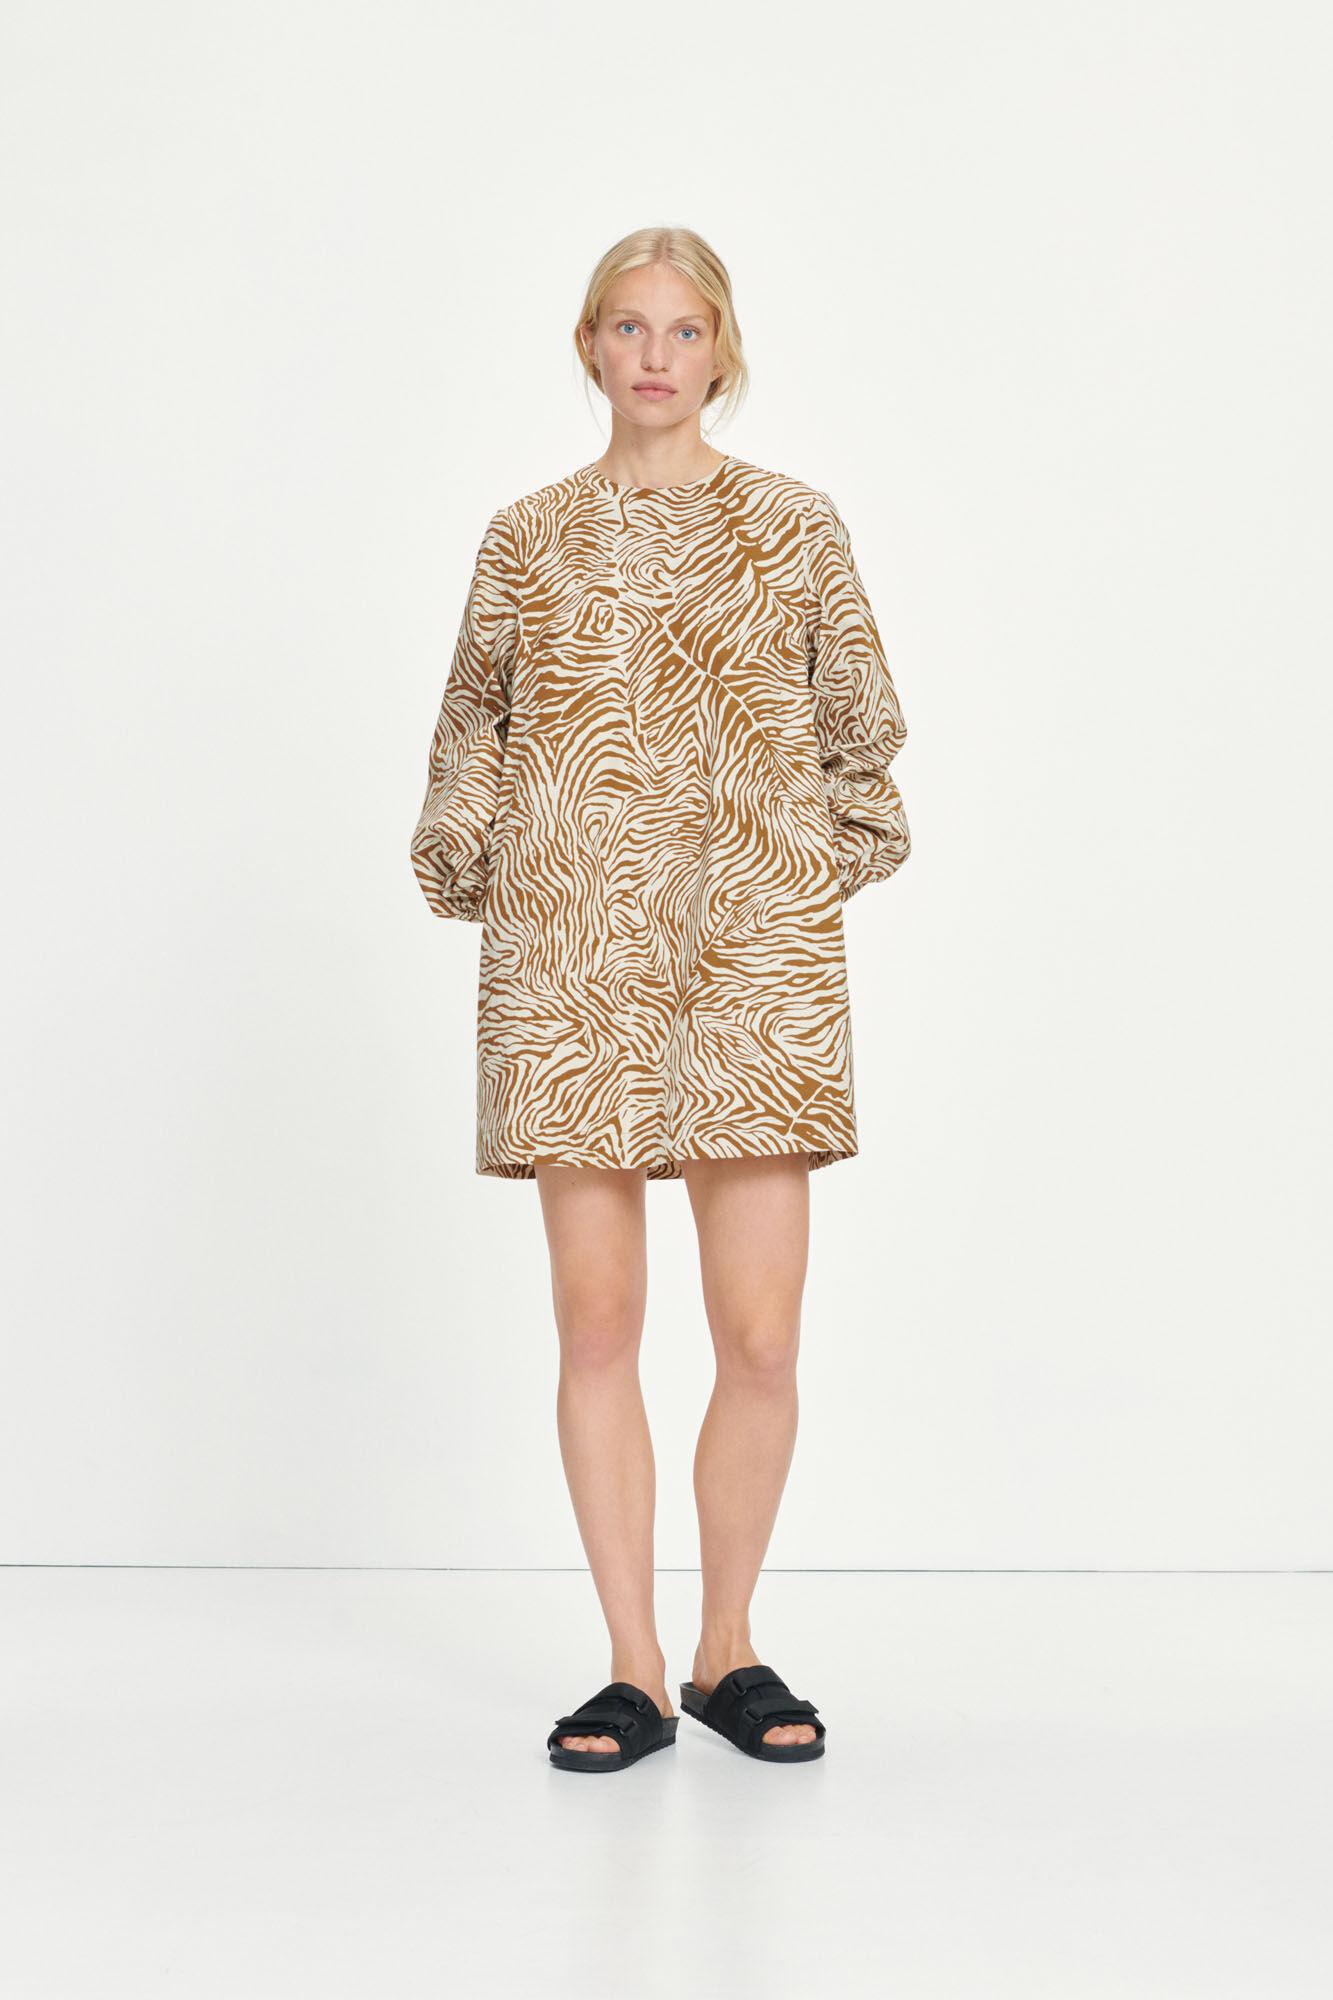 Aram short dress aop 10783